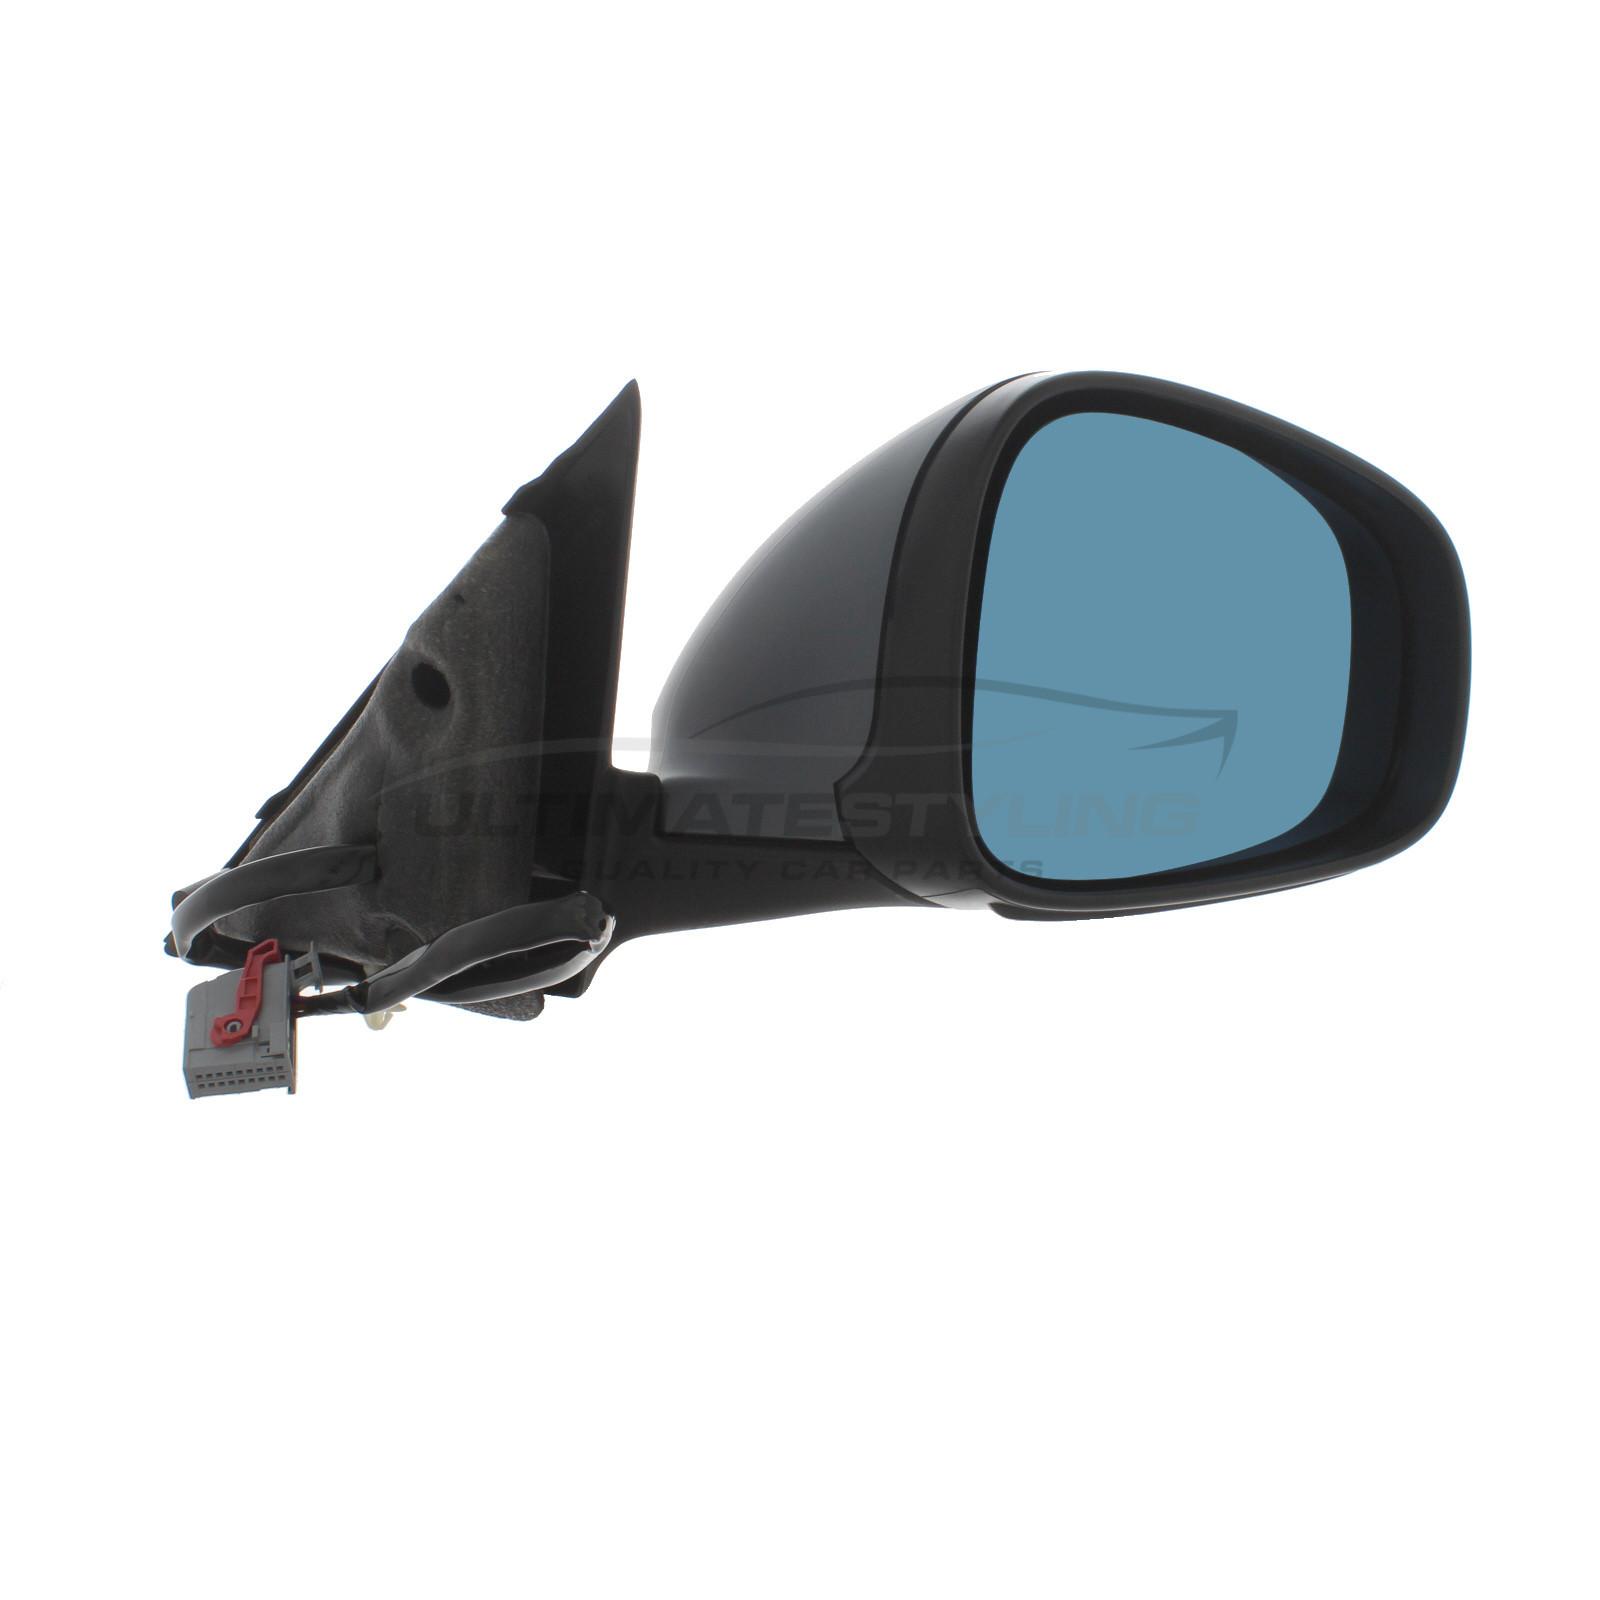 Alfa Romeo 159 Wing Mirror / Door Mirror - Drivers Side (RH) - Electric adjustment - Heated Glass - Temperature Sensor - Primed